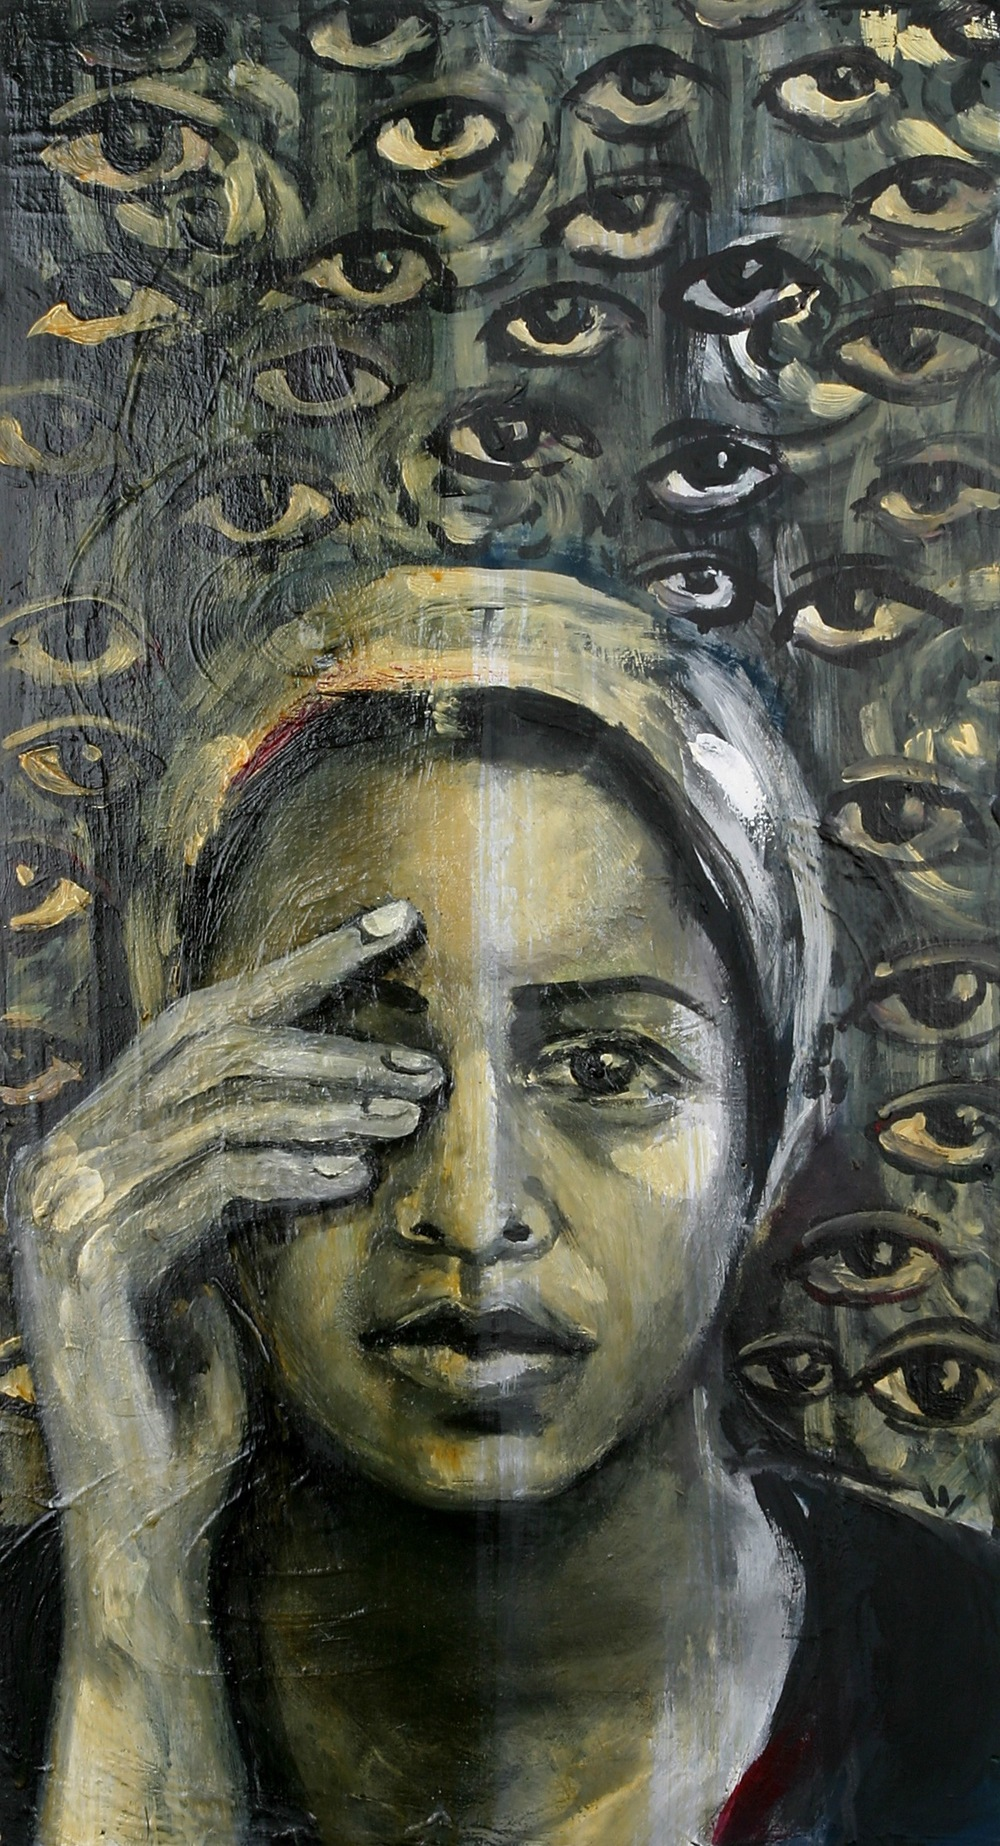 Neta Elkayam, Self Portrait as Baba-Sali, Biennale2013